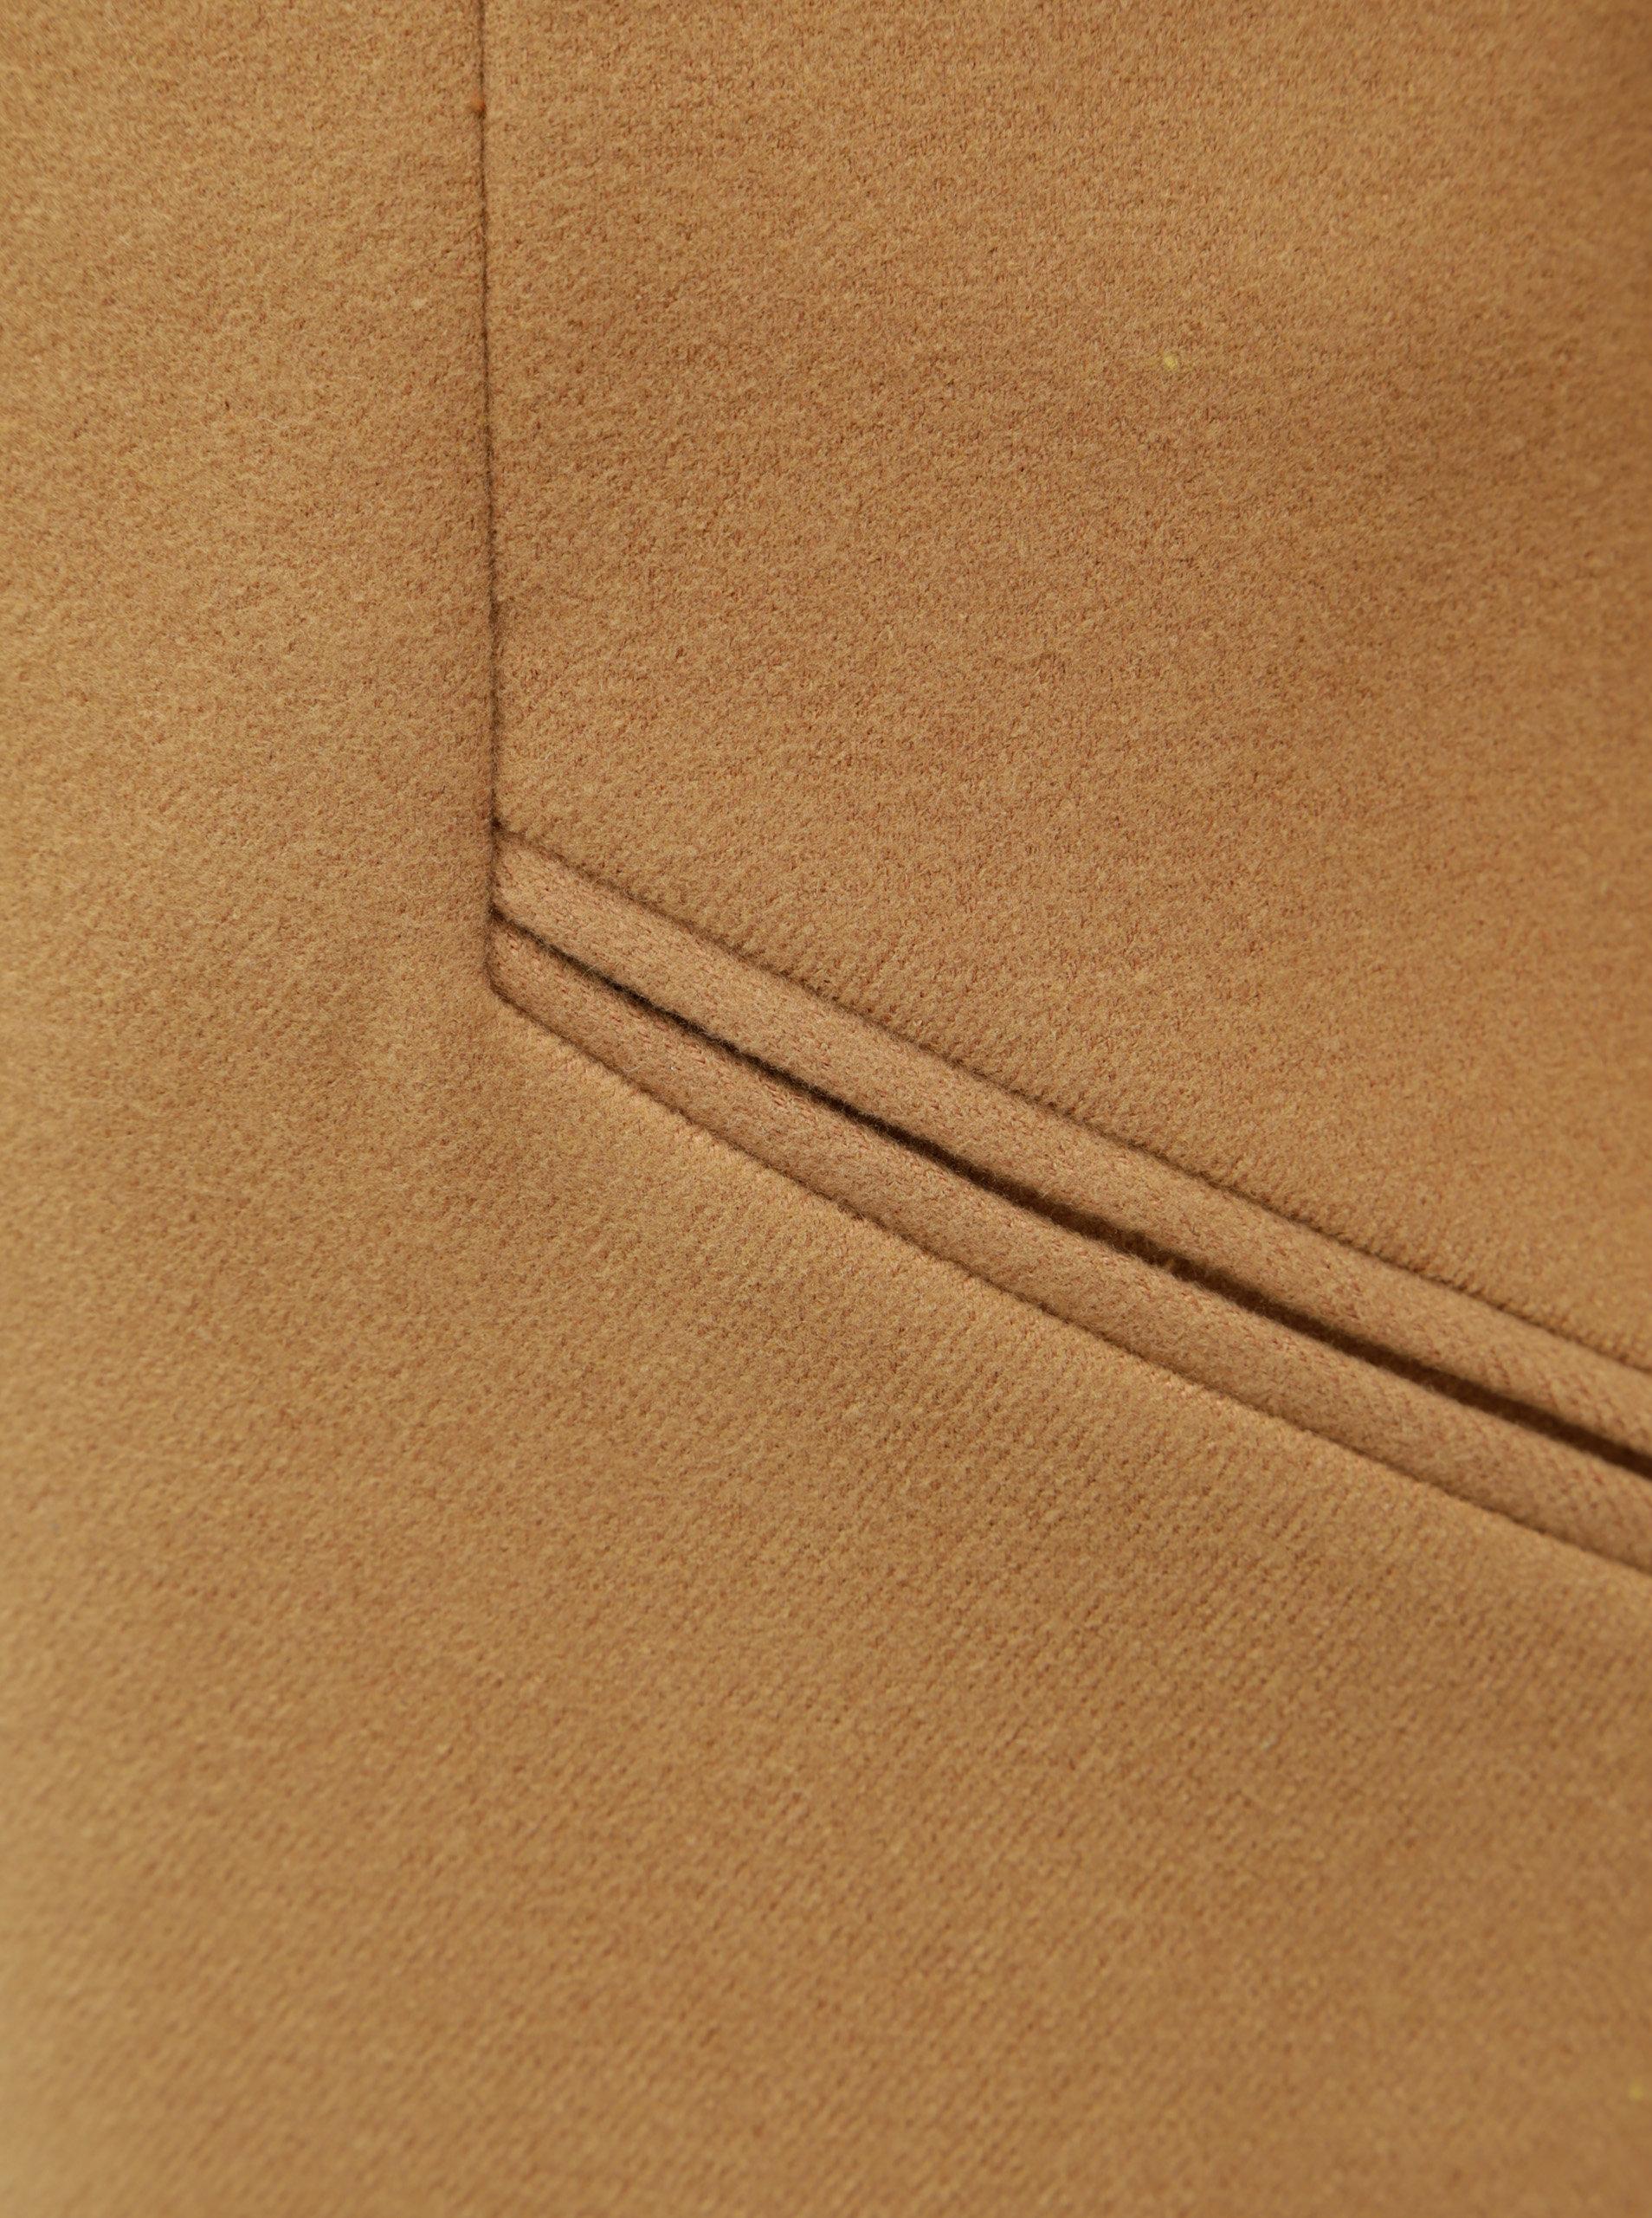 c7d81c63fa2 Hnědý kabát s kapsami VERO MODA ...